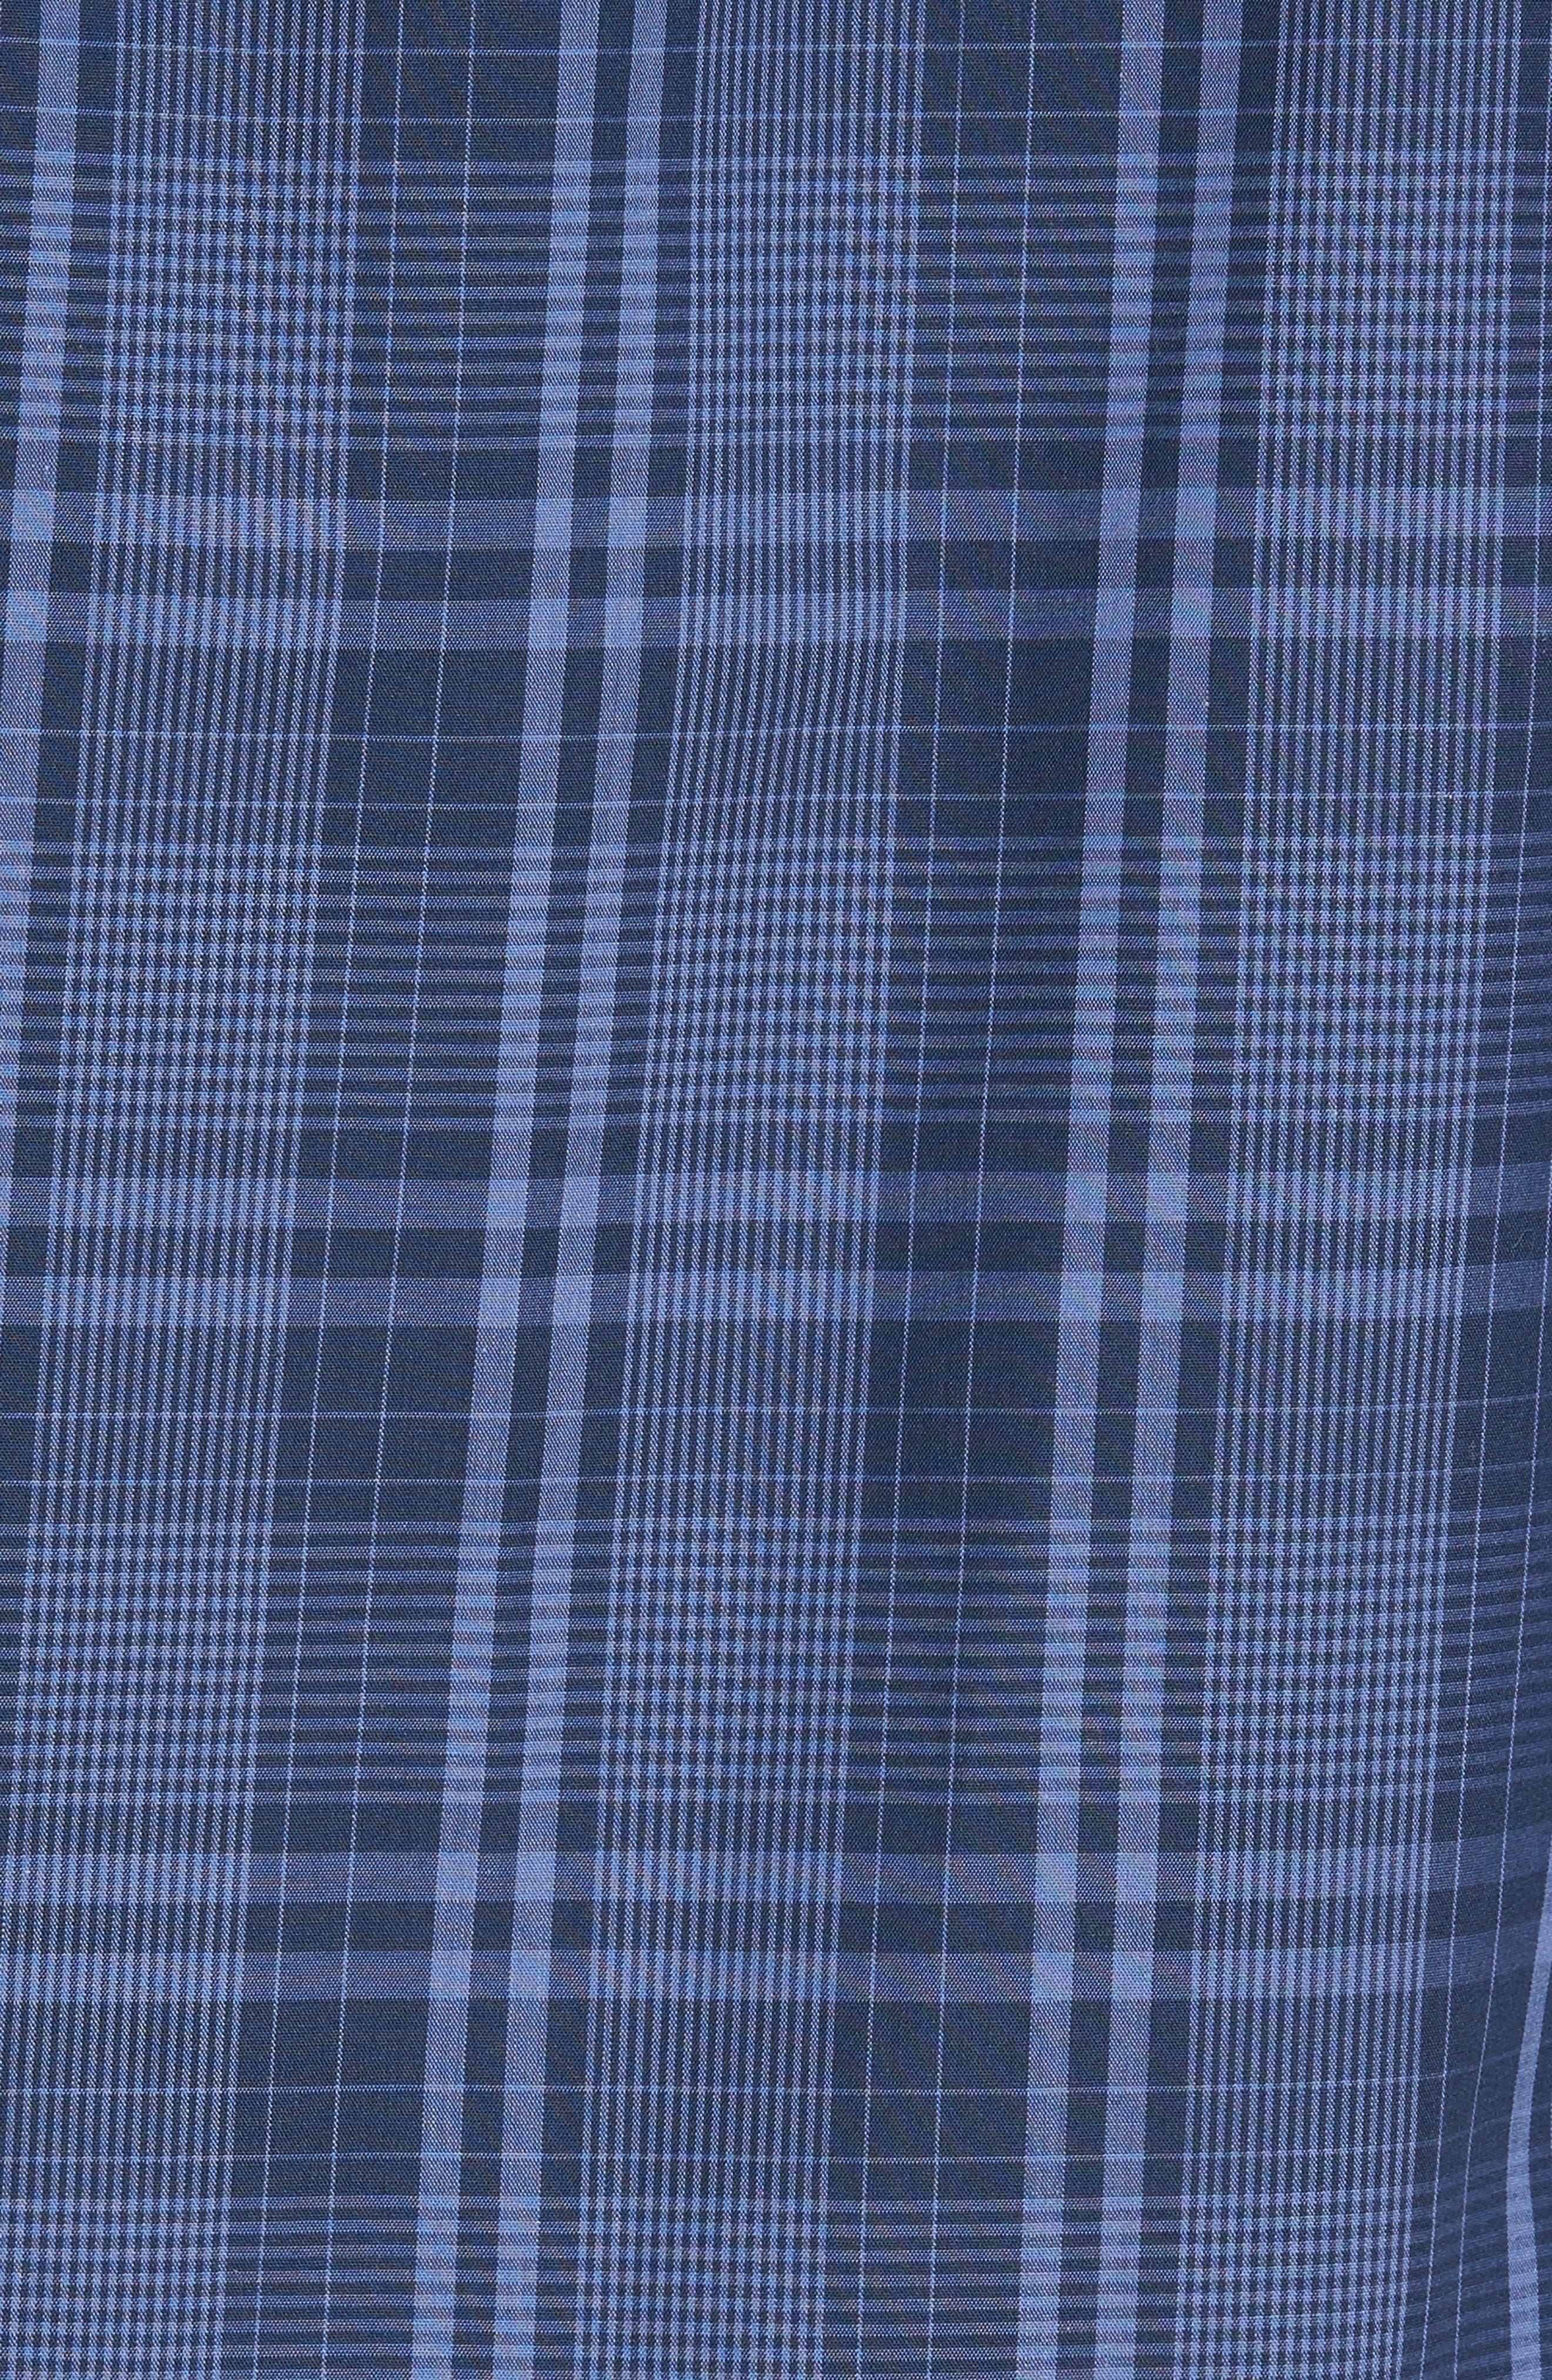 Slim Fit Plaid Sport Shirt,                             Alternate thumbnail 5, color,                             Navy Iris Blue Plaid